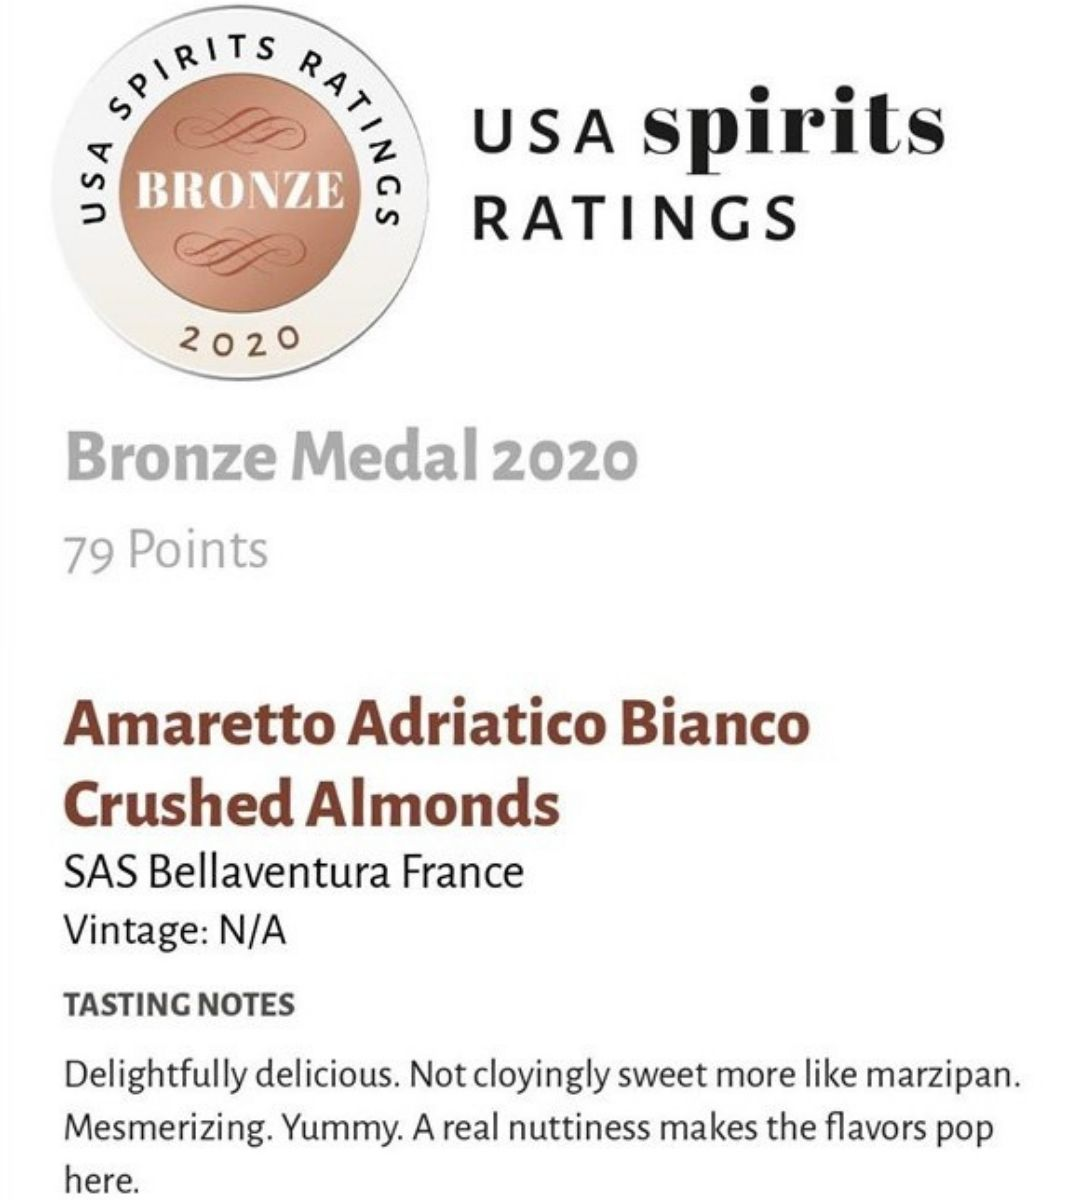 Amaretto Adriatico Bianco Crushed Almonds Bronze Medal USA Spirits Ratings